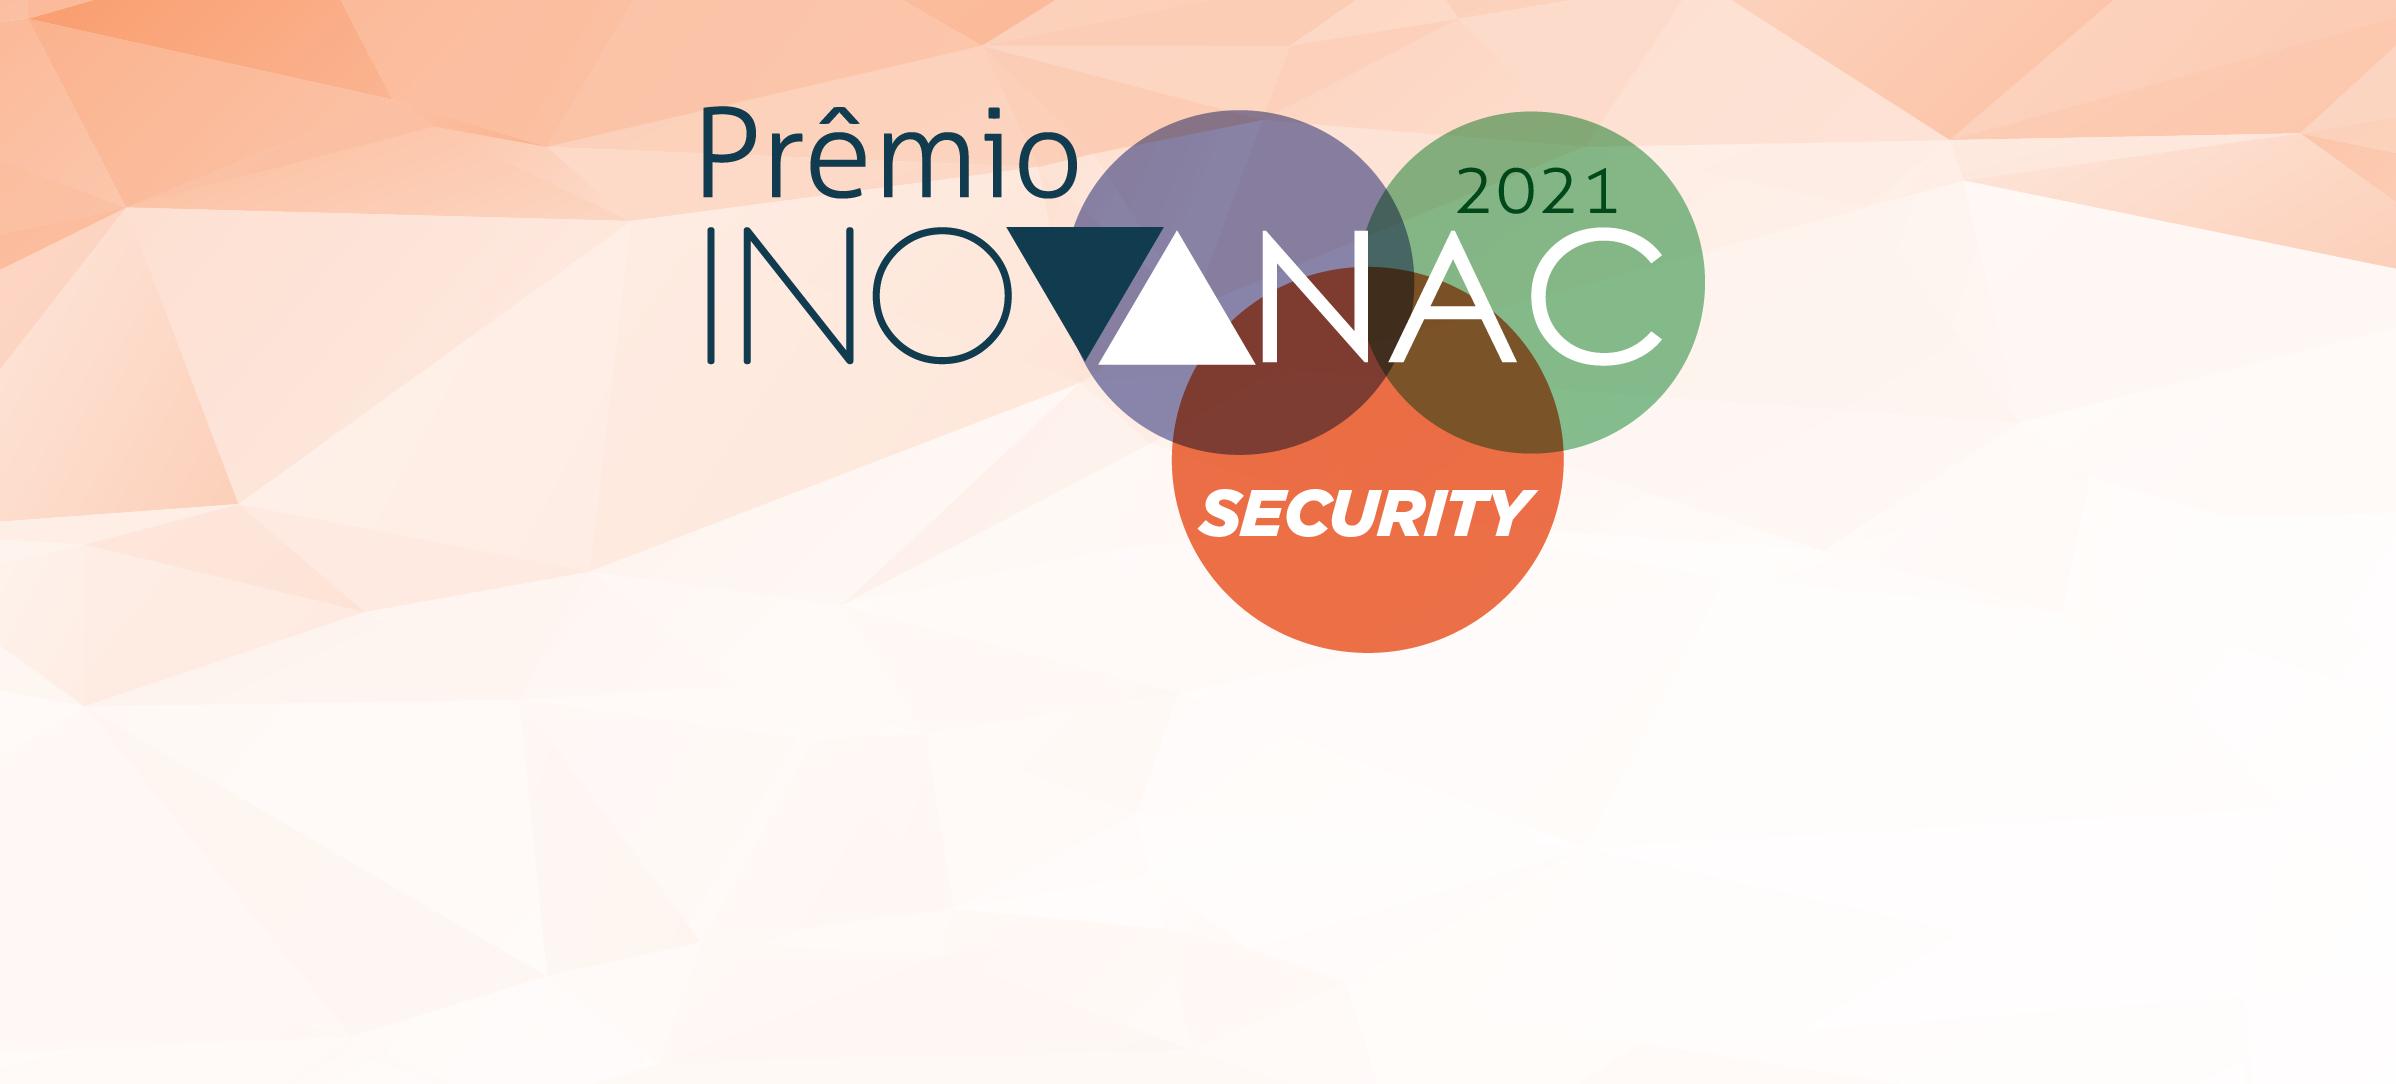 Inovanac Security